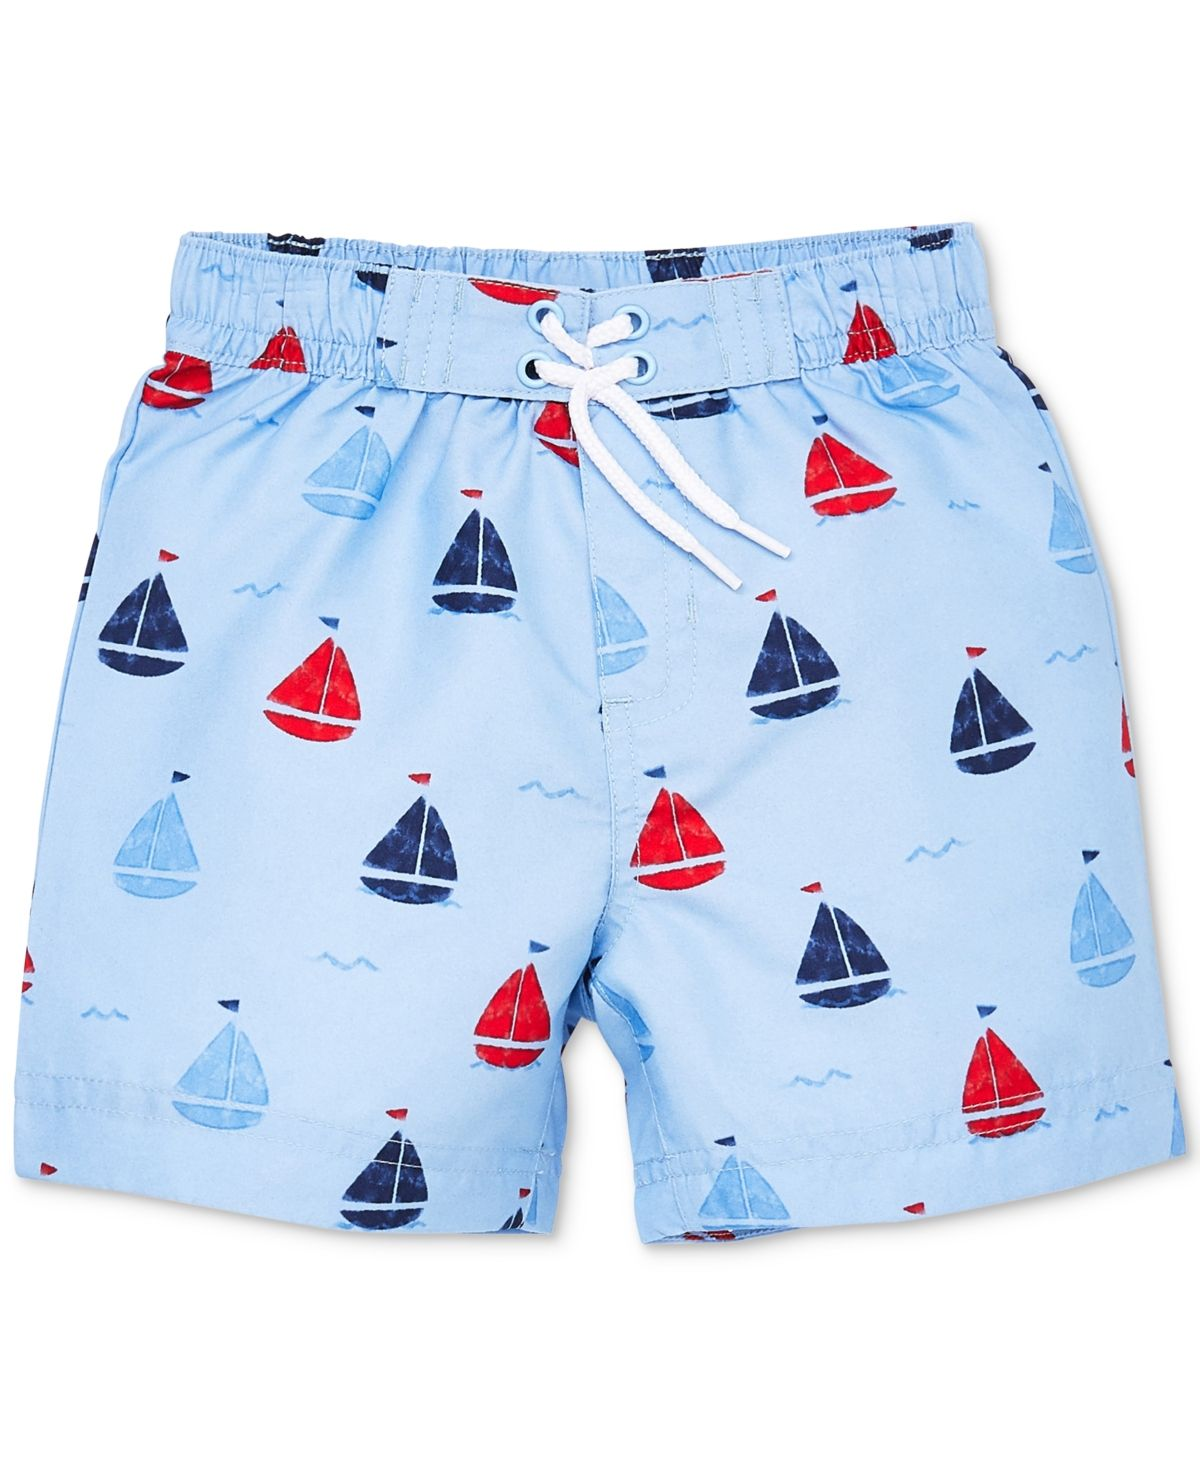 Dsood Boys Swim Trunks Boardshorts Kids Beach Swim Shorts Printed Beach Wear Girls Funny Quick Dry